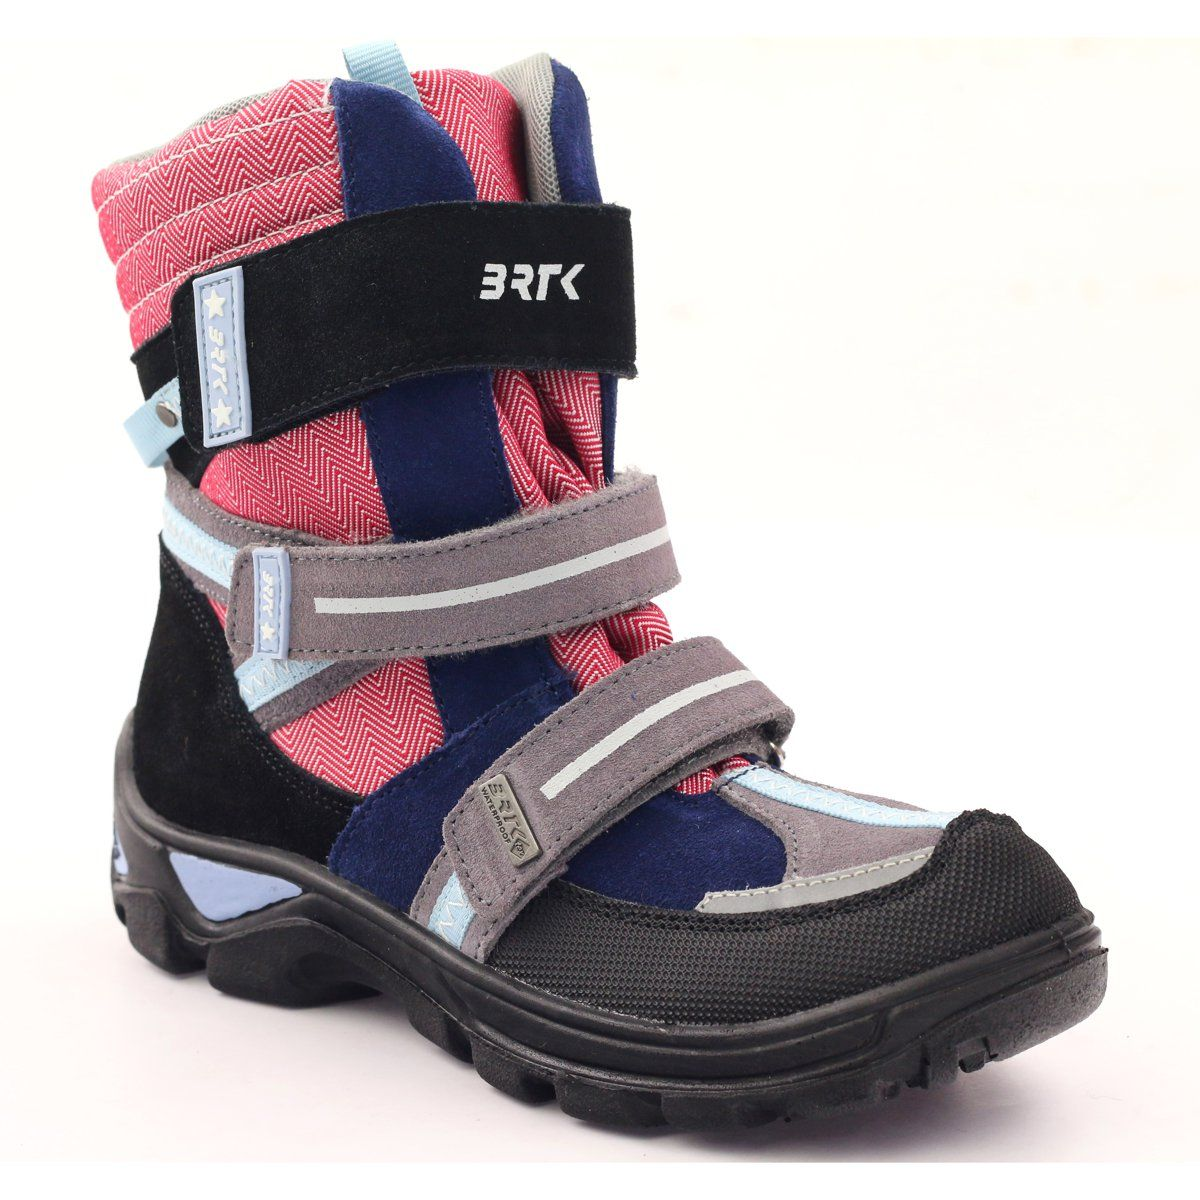 Bartek Boots Waterproof Boots 27137 Childrens Boots Boots Waterproof Boots